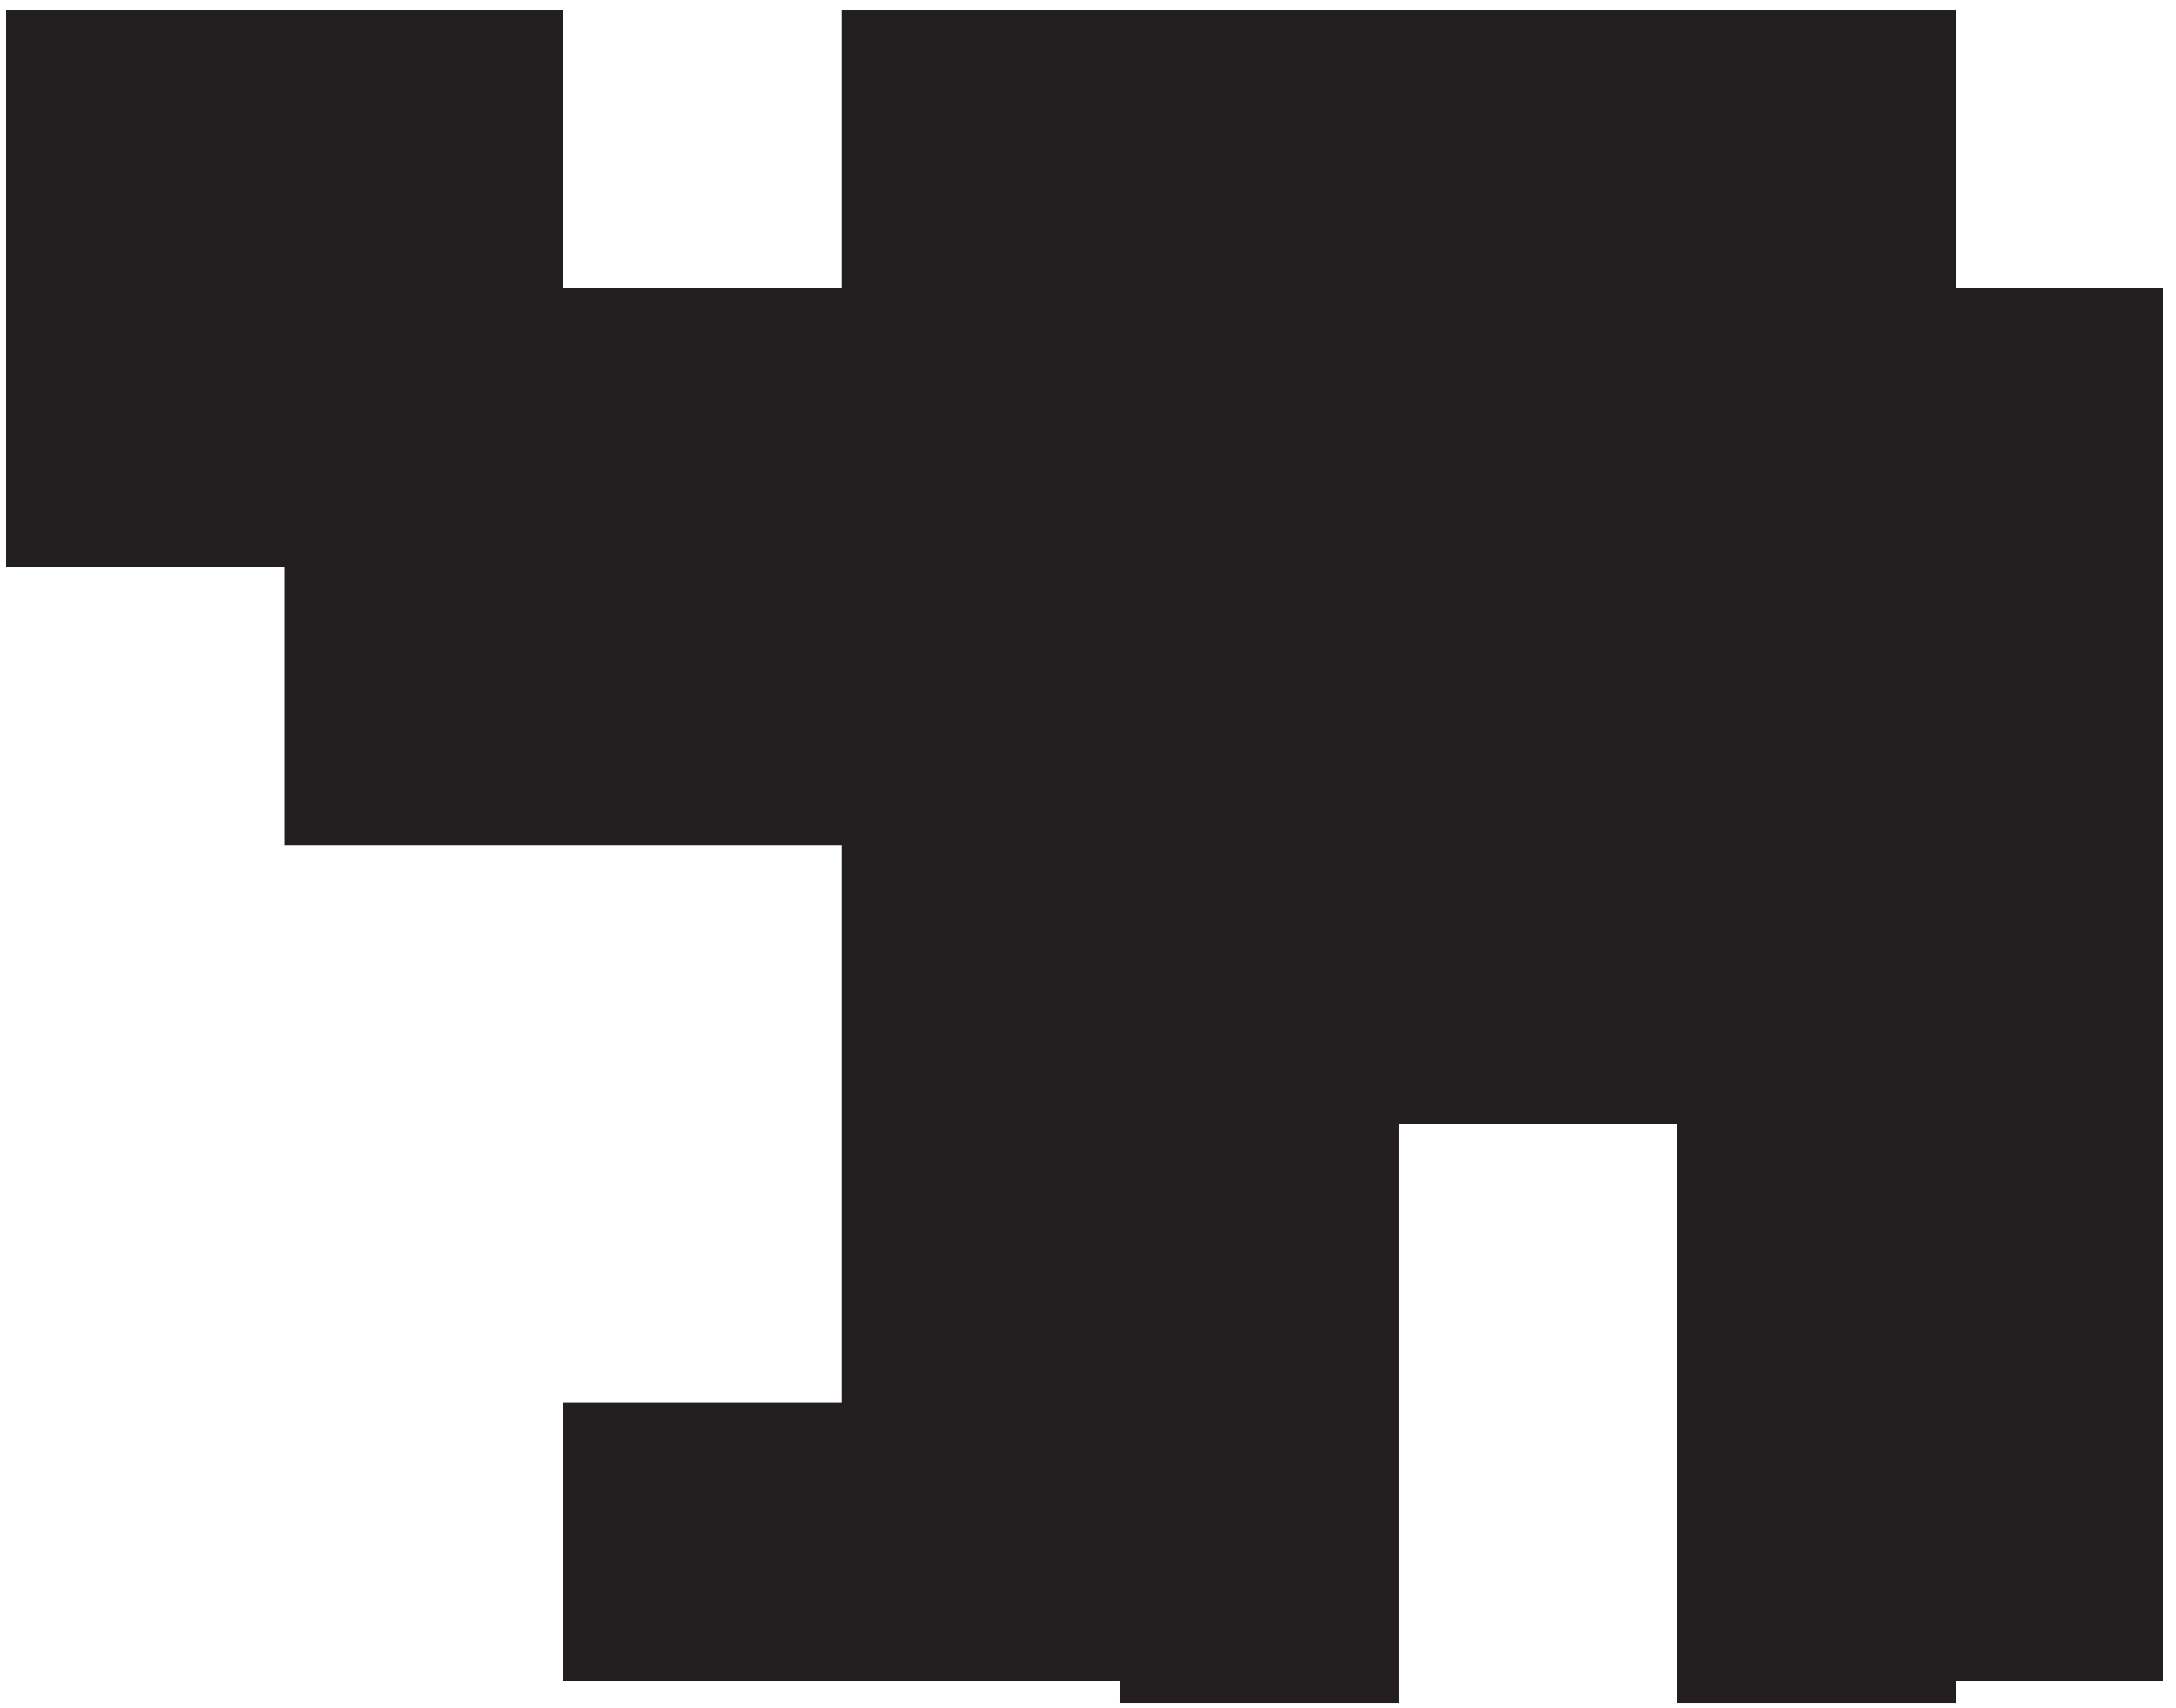 8000x6279 Camel Silhouette Transparent Png Clip Artu200b Gallery Yopriceville